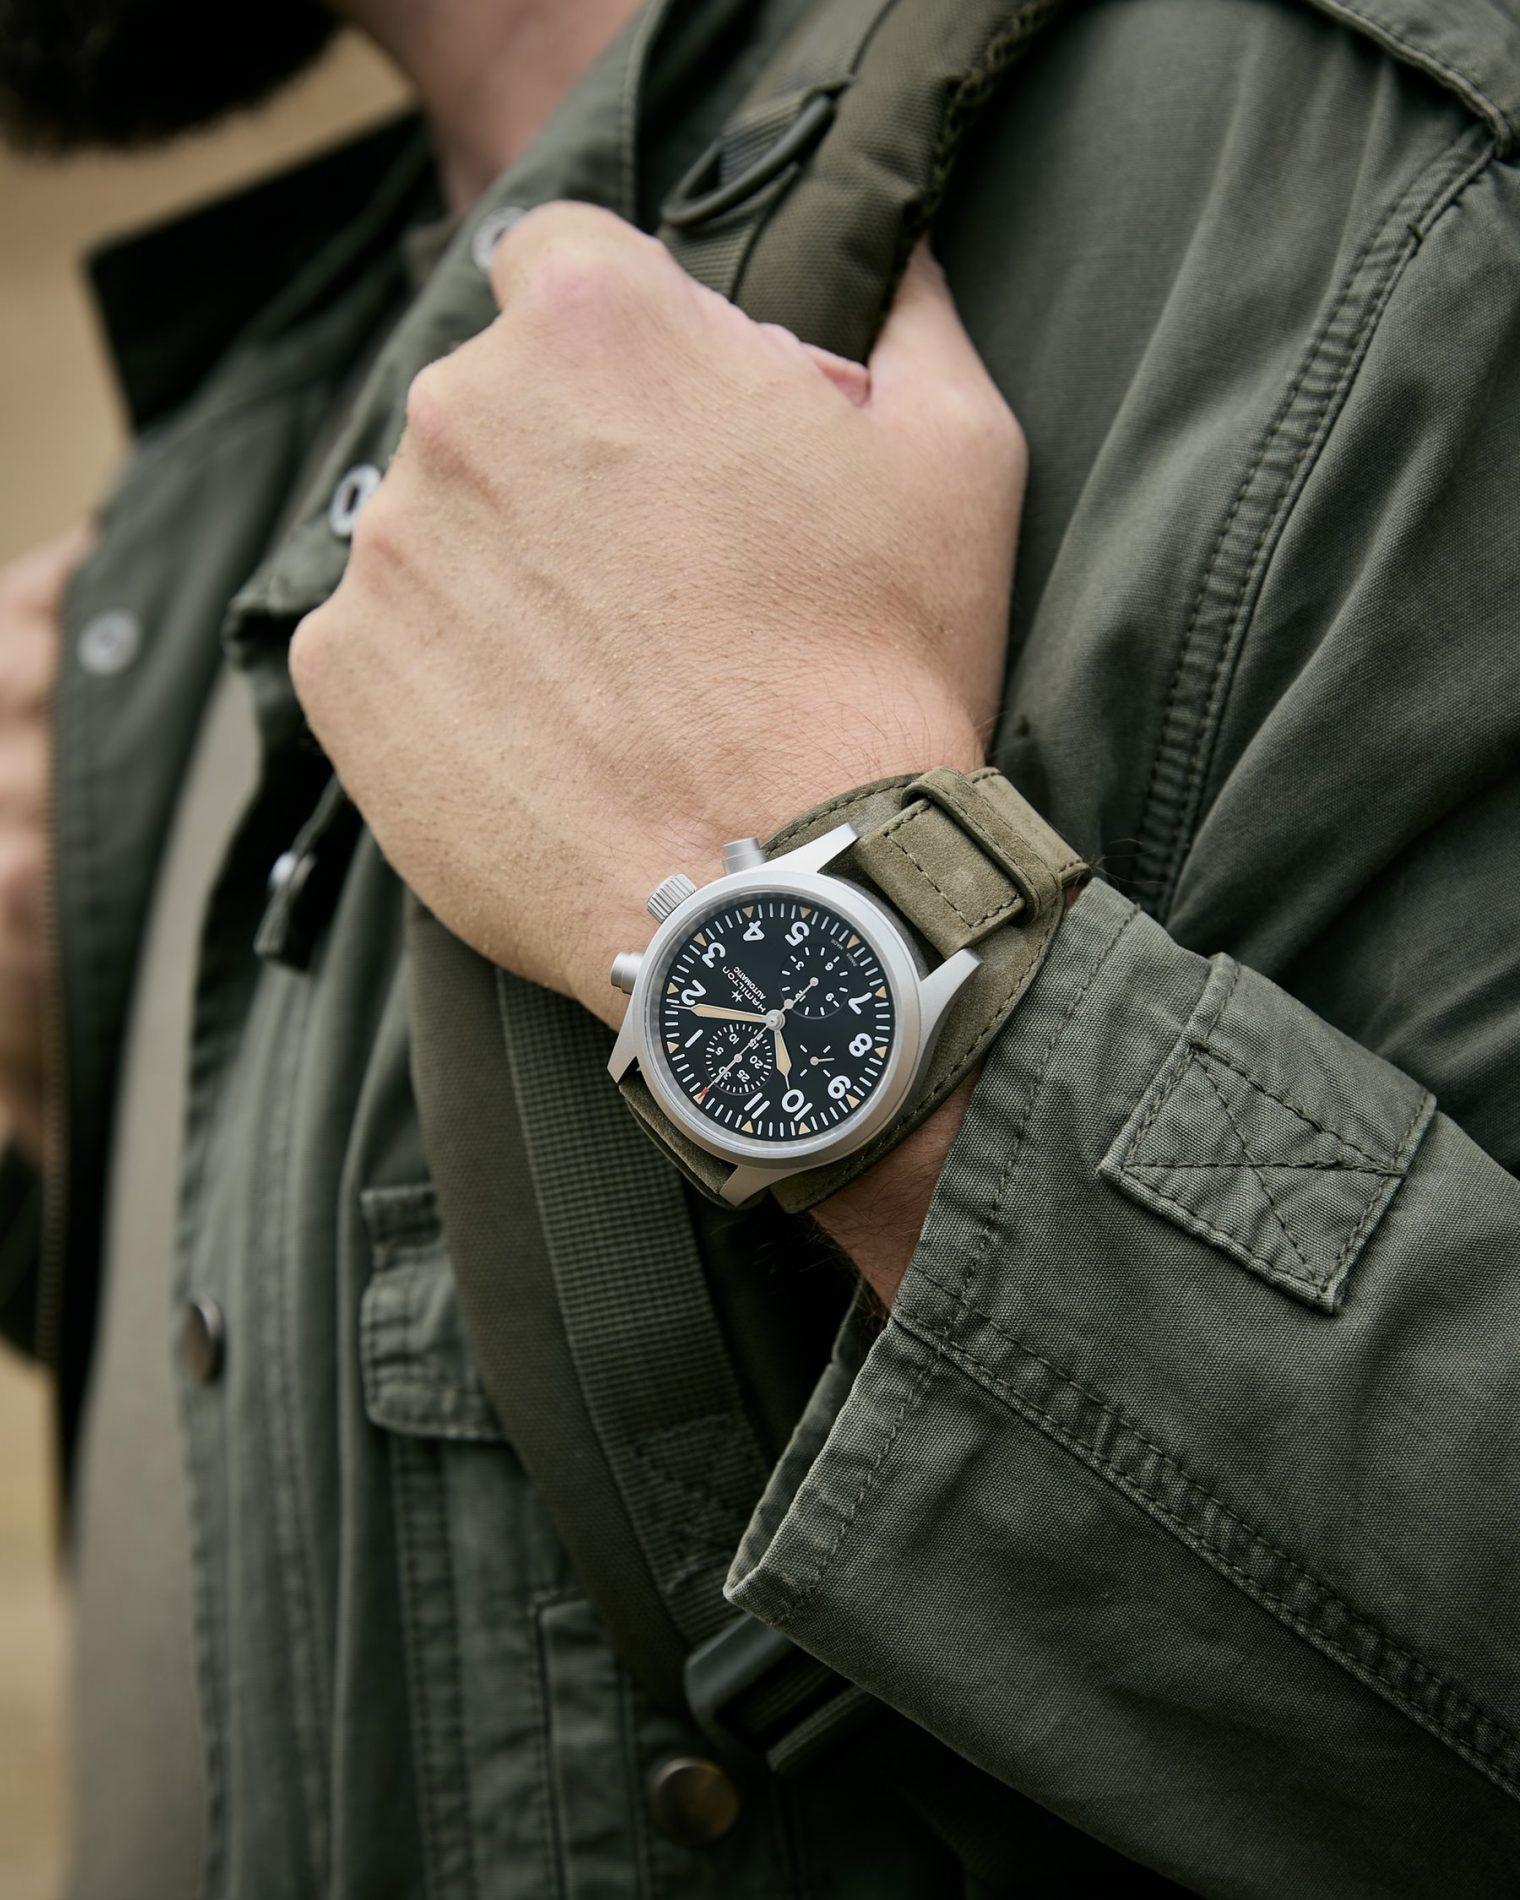 Hamilton Khaki Field Automatic Chronograph H71706830 Lifestyle wristshot